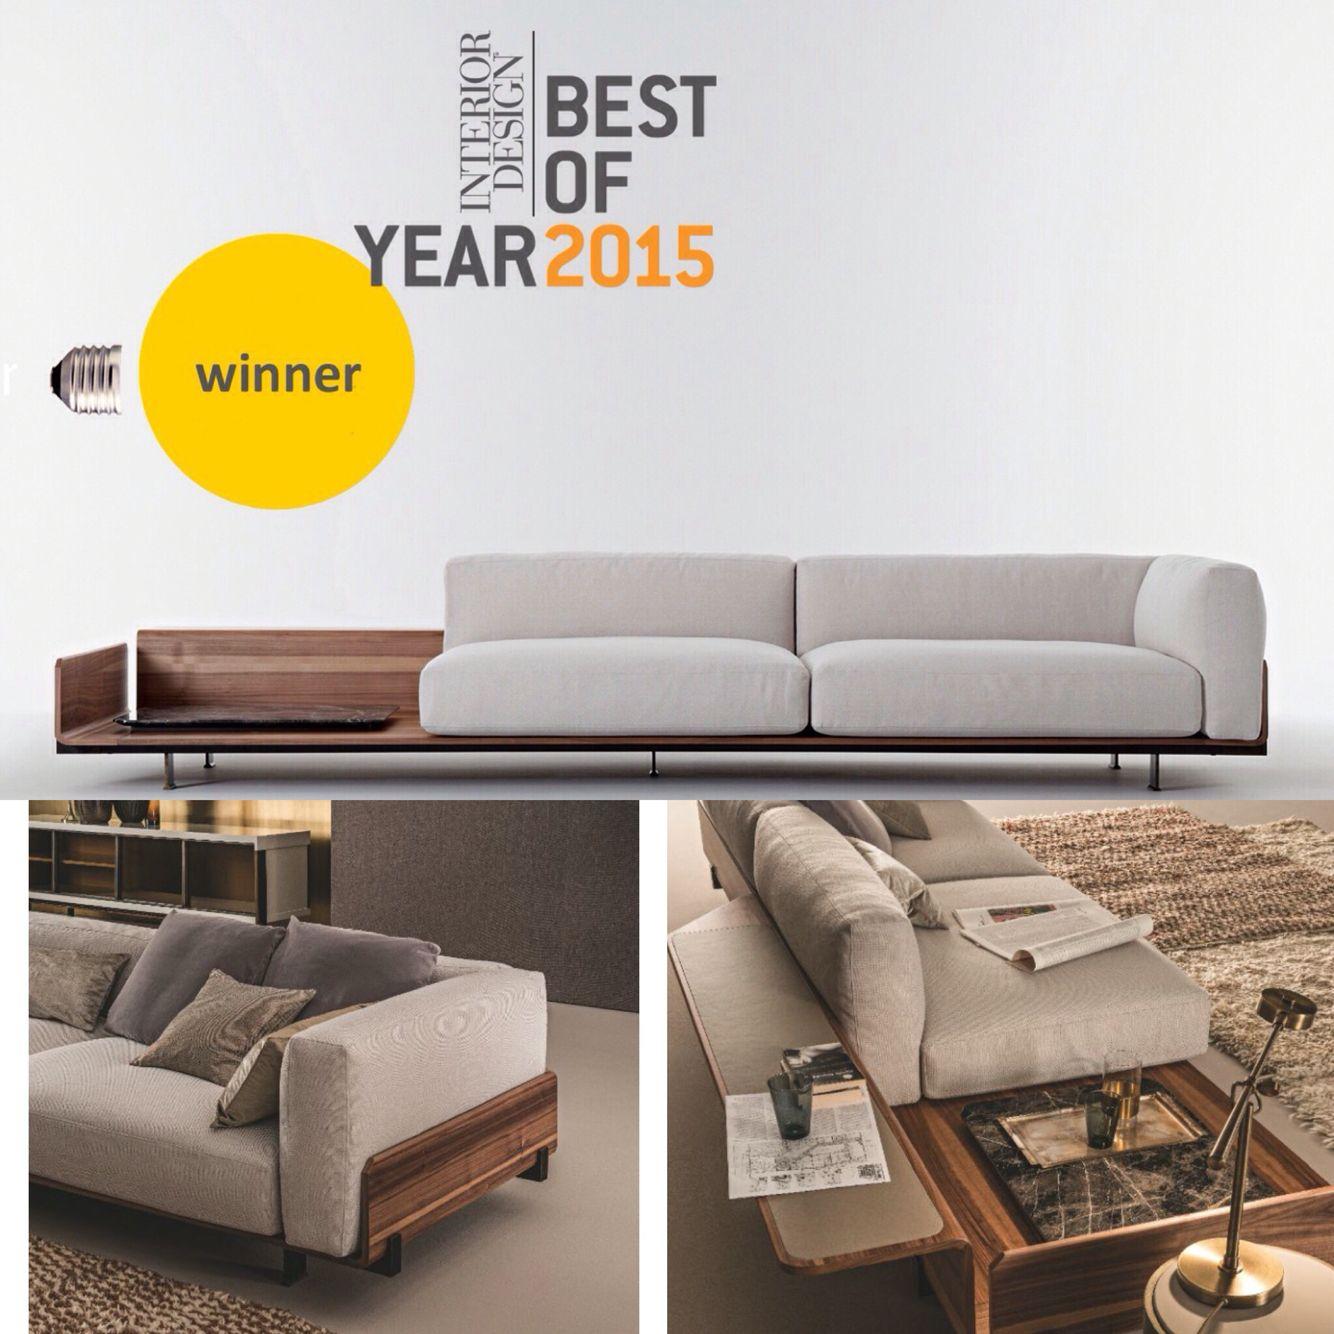 Casaintl Positano Took Home A 2015 Best Of Year Award From Interior Design Magazine